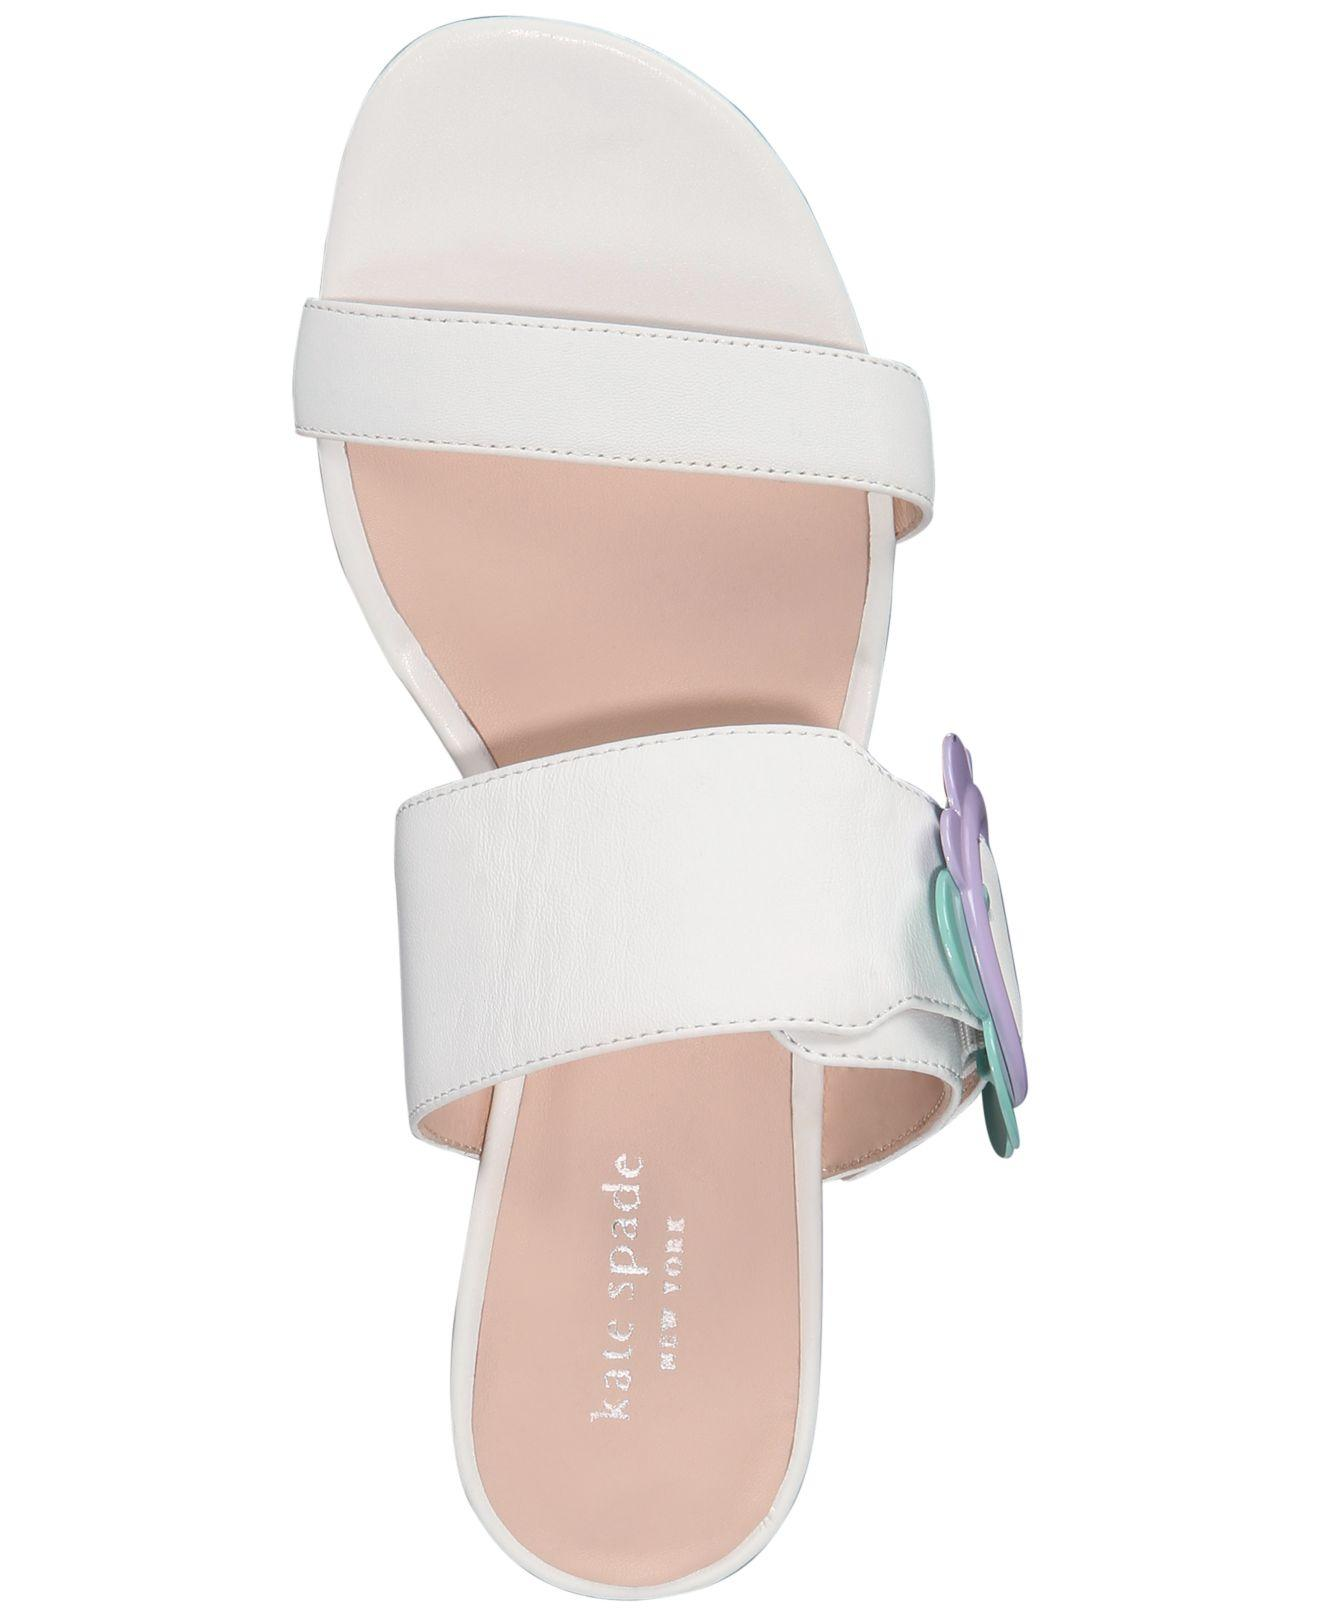 Kate Spade Fabi Sandals in White - Save